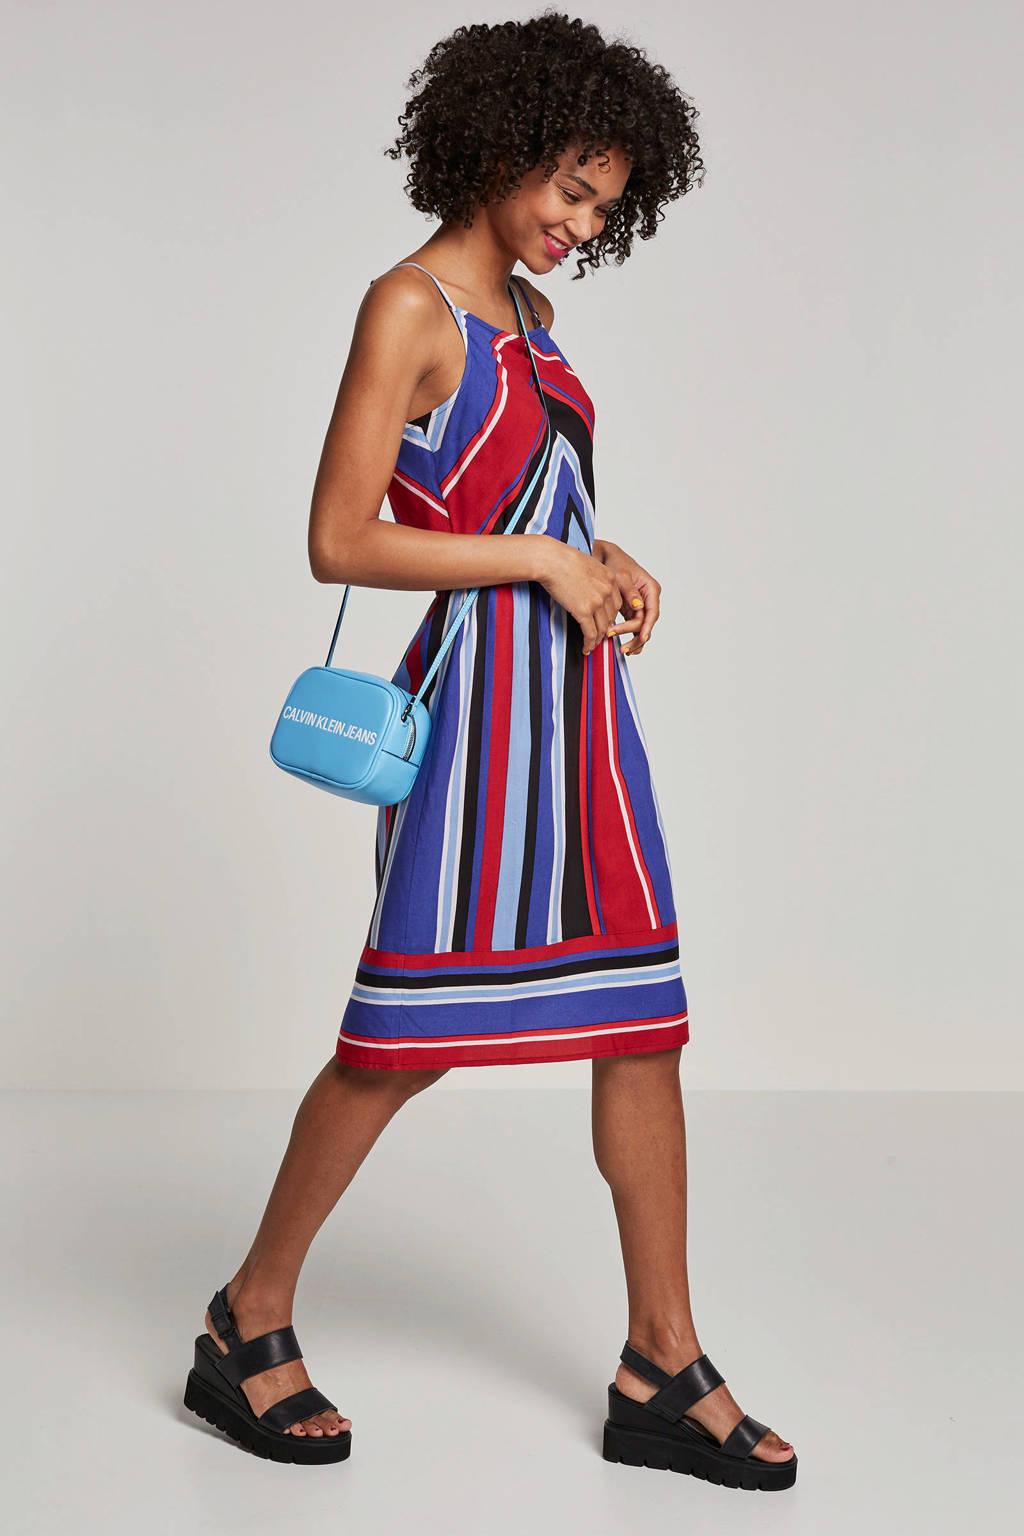 whkmp's beachwave geweven viscose jurk met streepprint, Blauw/rood/ecru